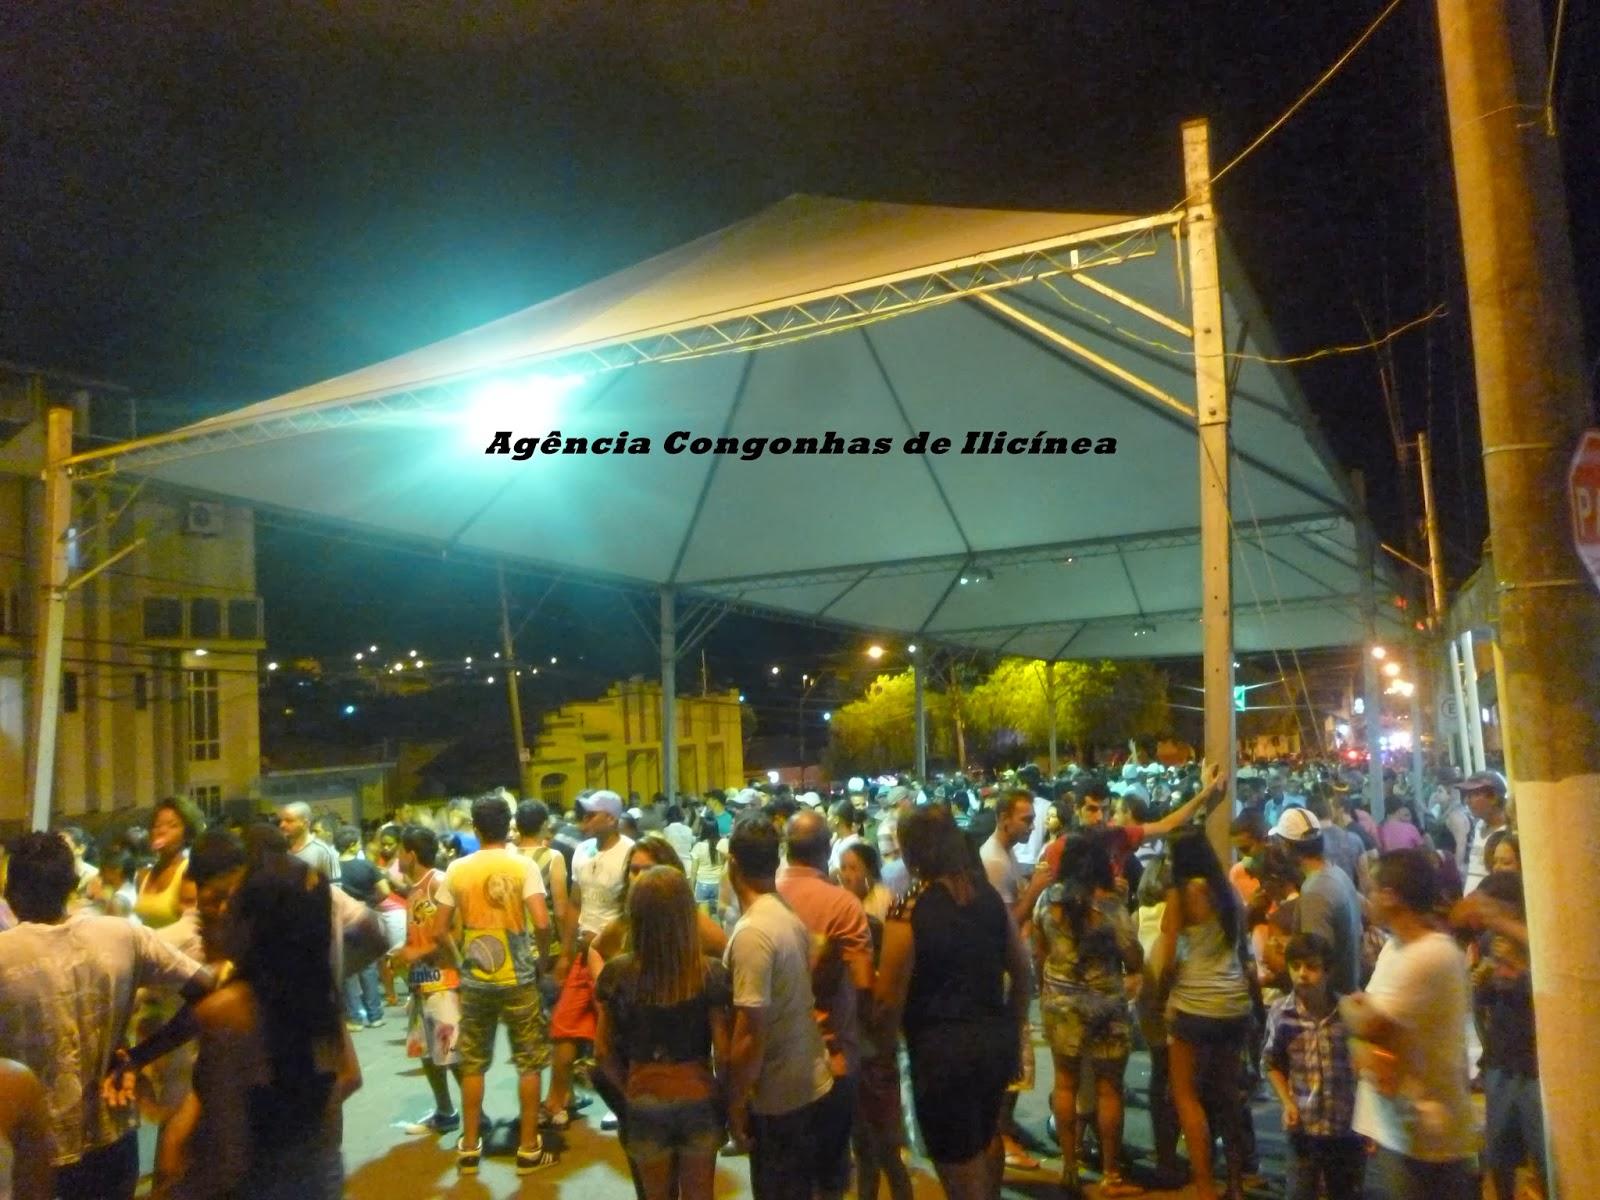 Carnaval 2014 em Ilicínea